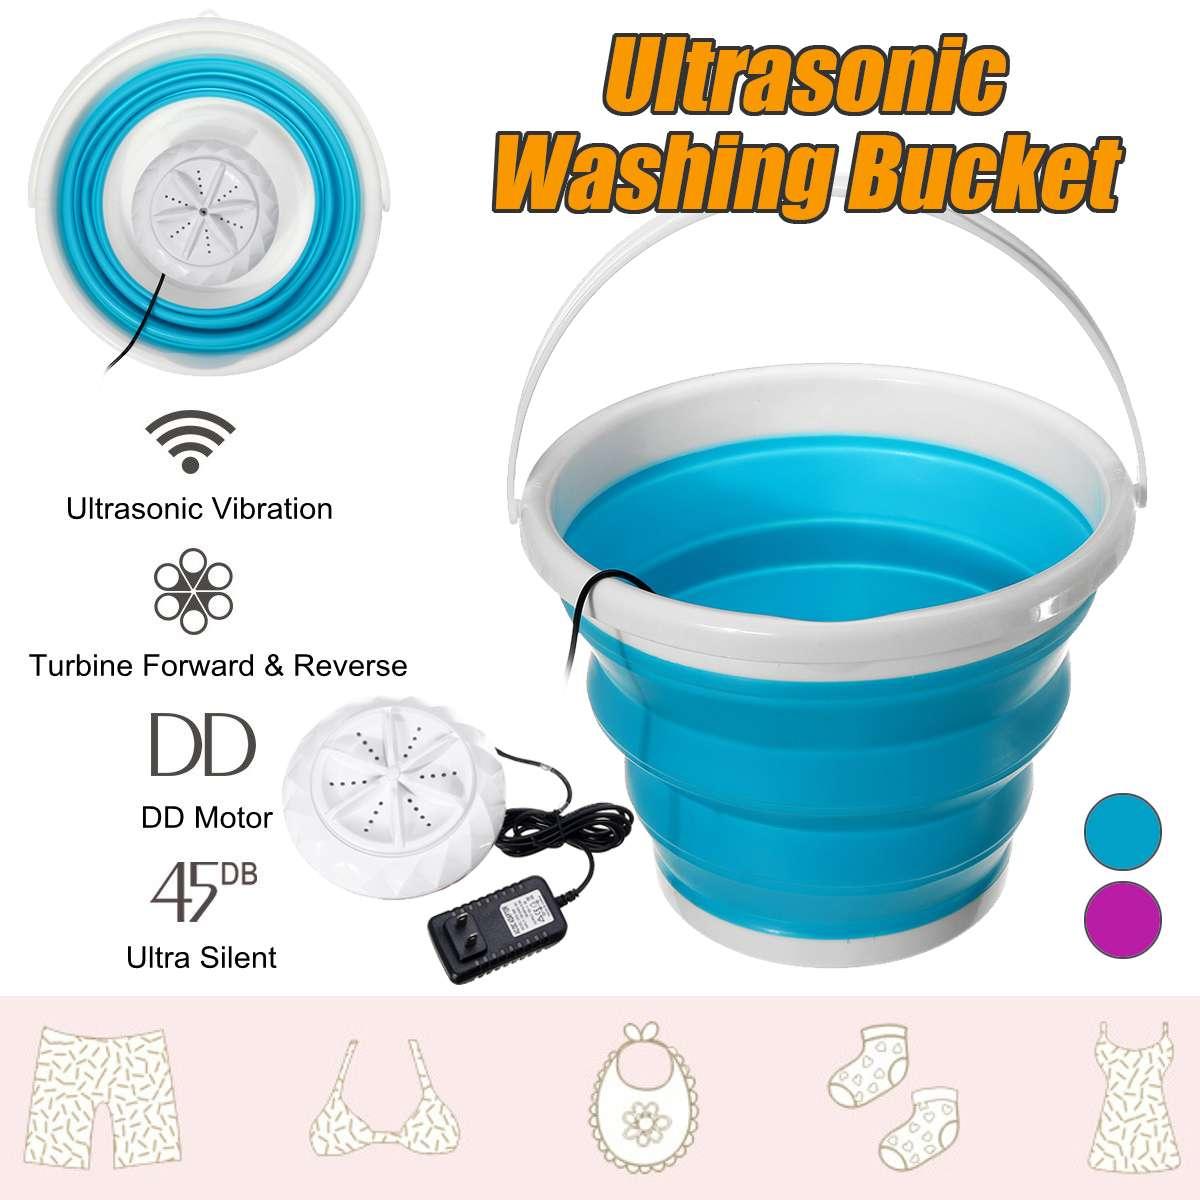 100-240v Mini Ultrasonic Washing Machine Foldable Bucket Type USB Laundry Clothes Washer Cleaner For Home Travel